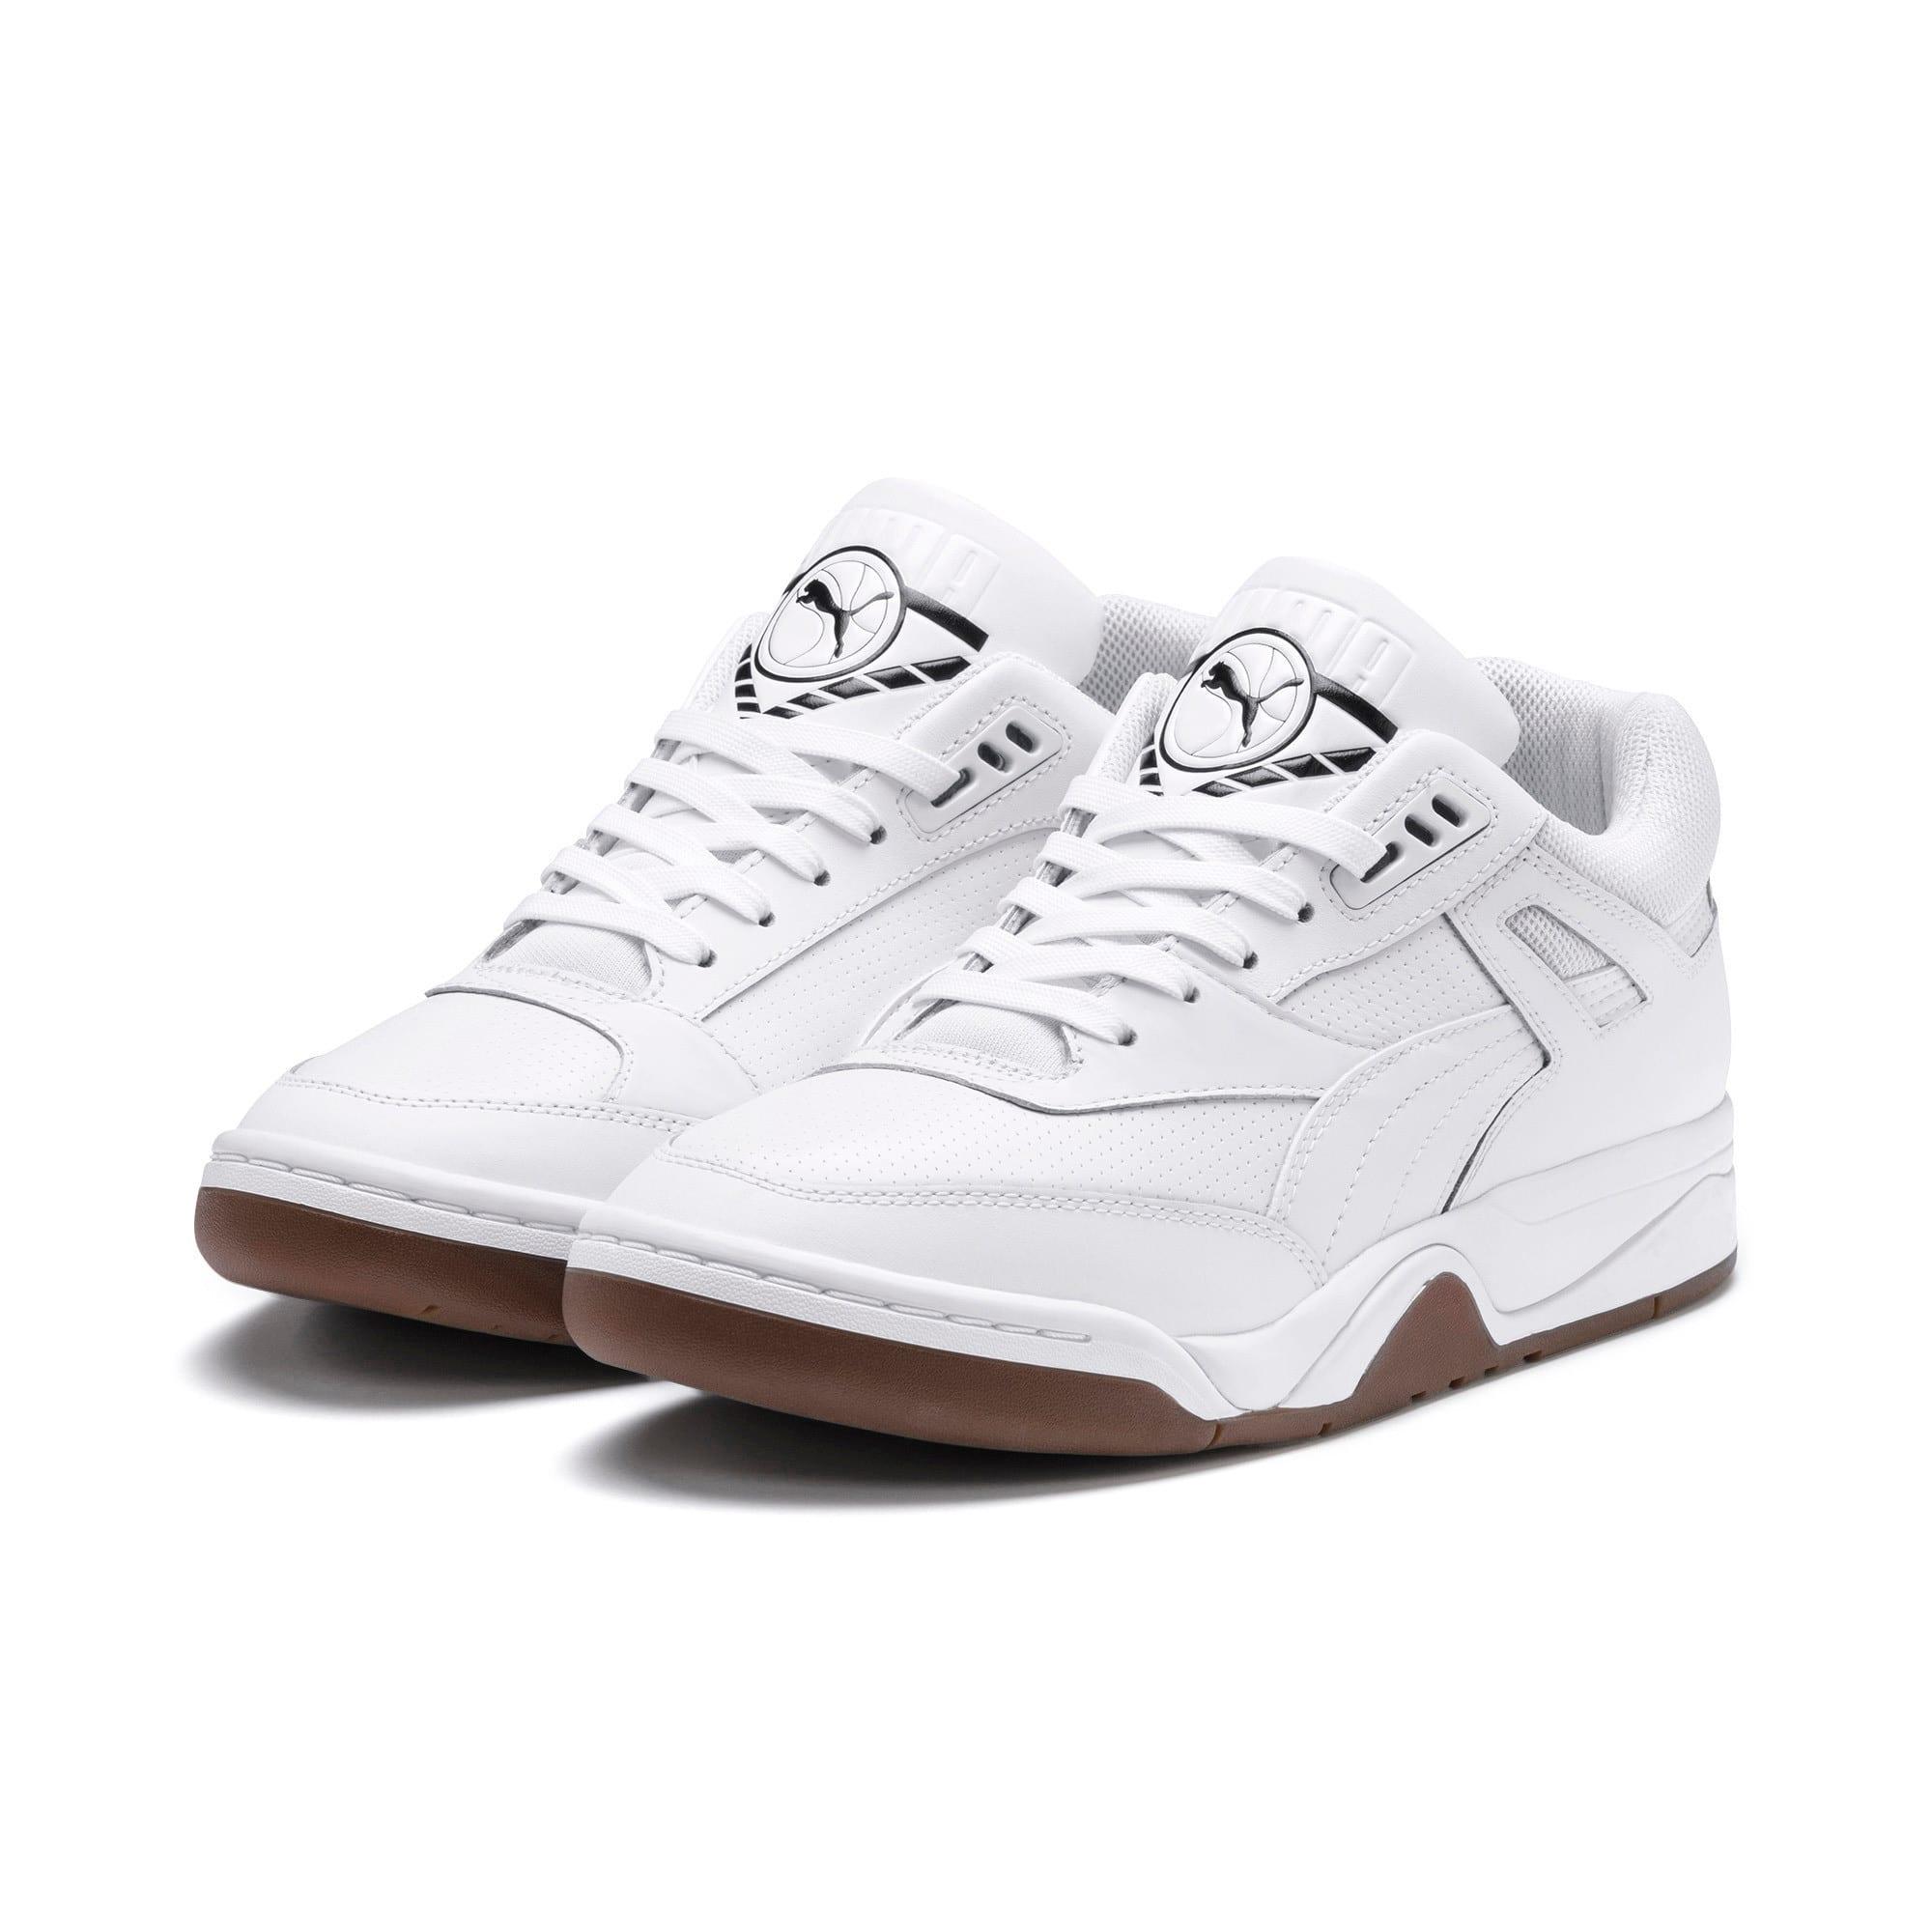 Thumbnail 2 of Palace Guard Sneakers, Puma White-Puma White-Gum, medium